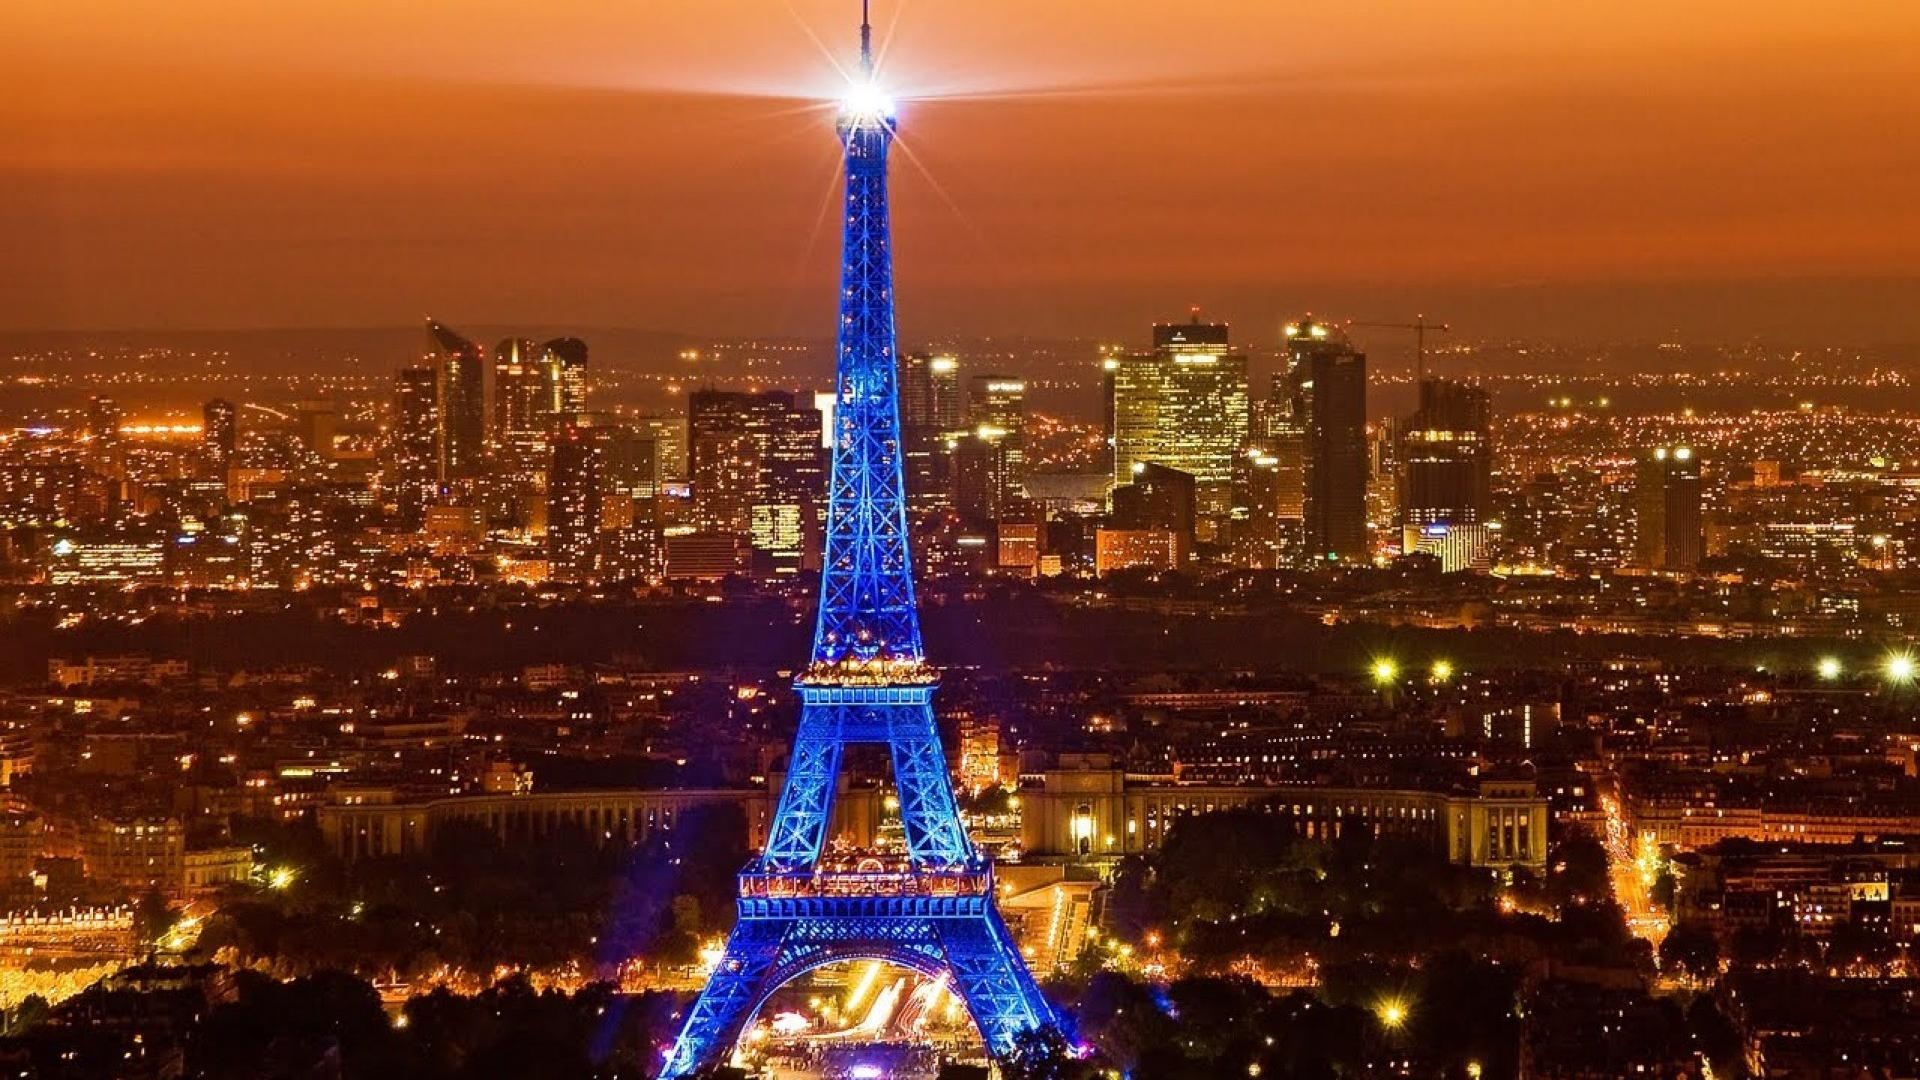 Paris city night wallpaper 81910 1920x1080